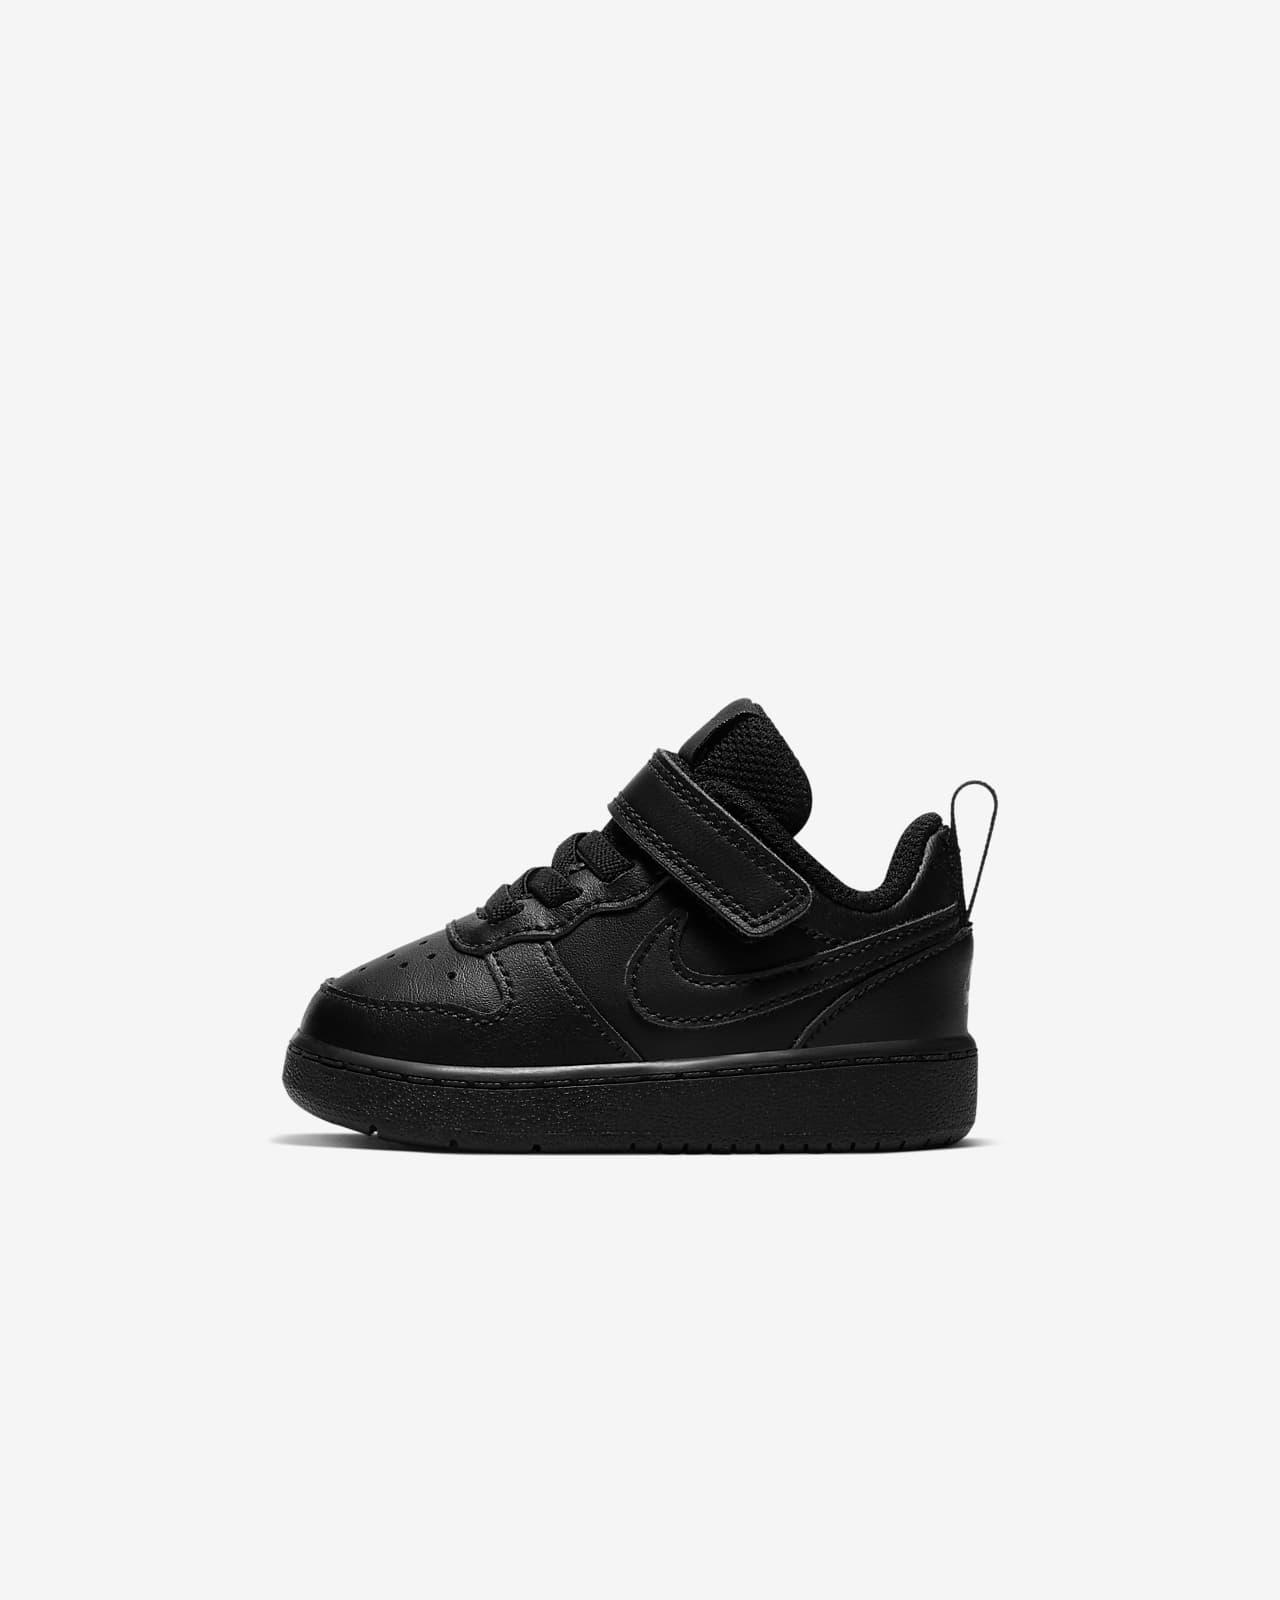 Domar Pericia Transitorio  Nike Court Borough Low 2 Zapatillas - Bebé e infantil. Nike ES